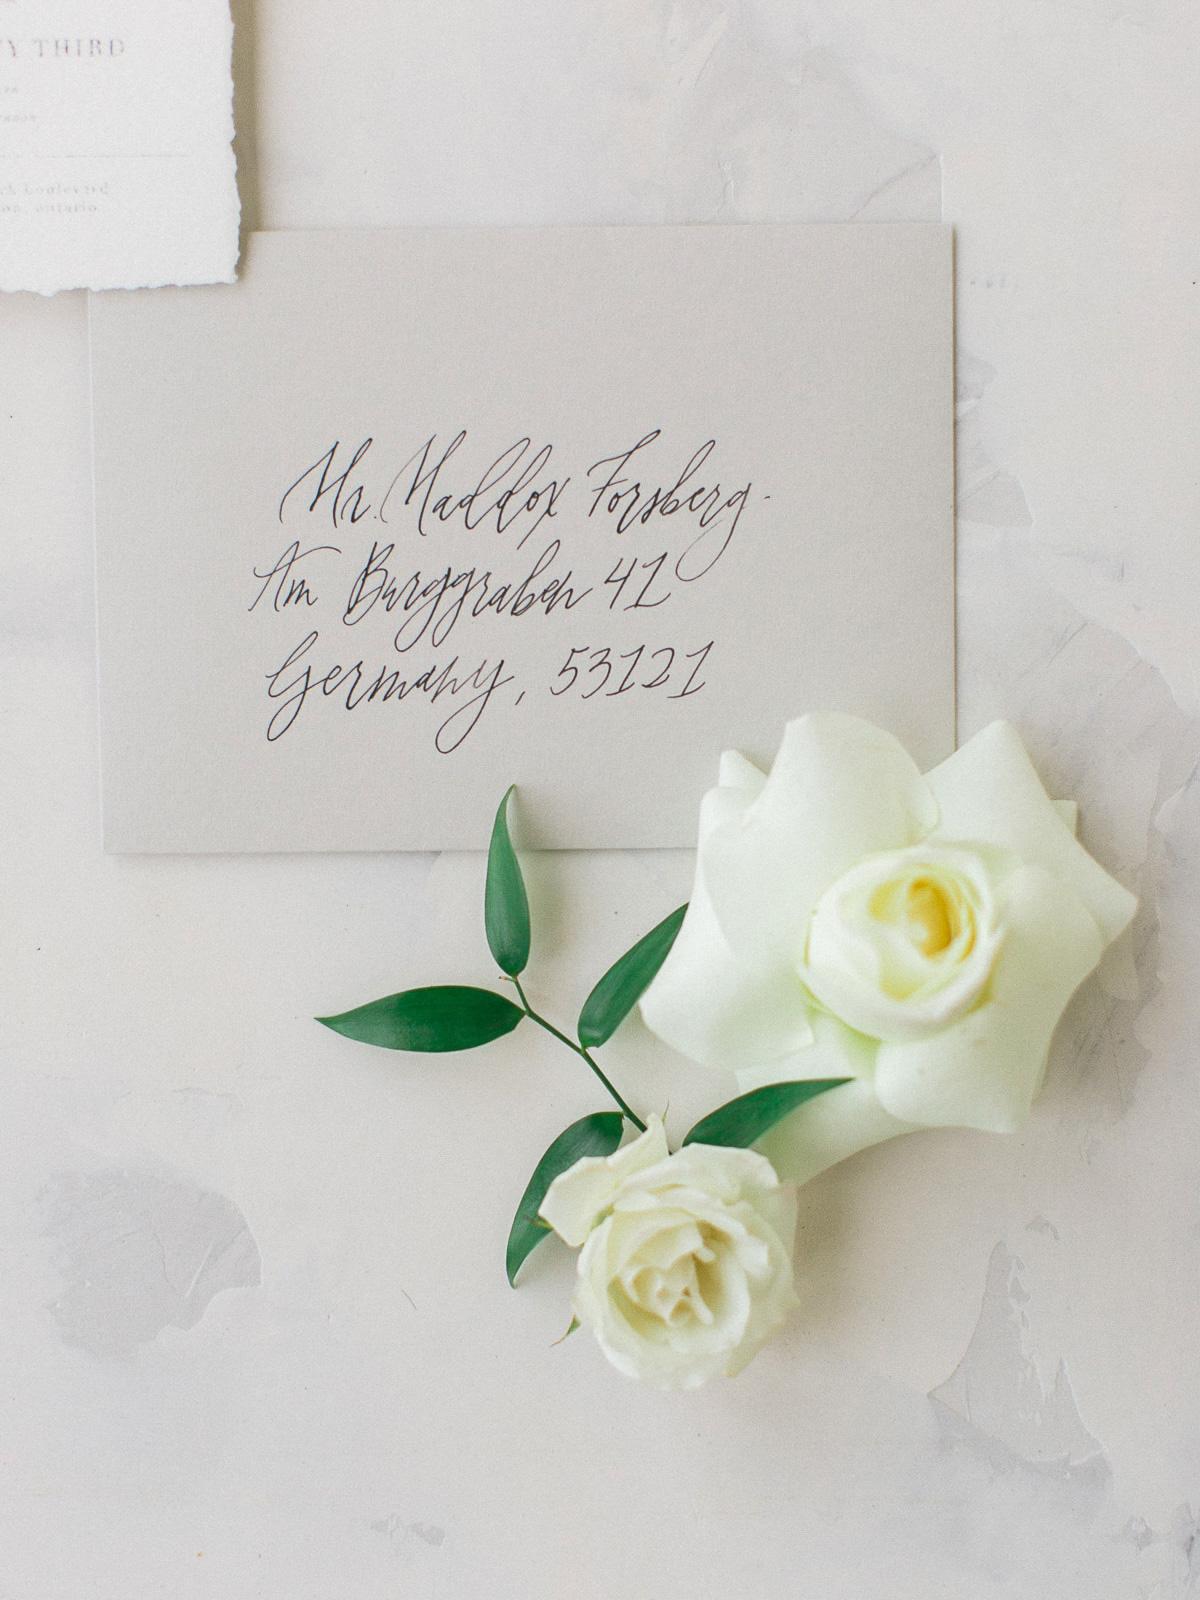 kurtz-orpia-photography-vineyard-bride-swish-list-dundurn-castle-dundas-wedding-editorial-6.jpg